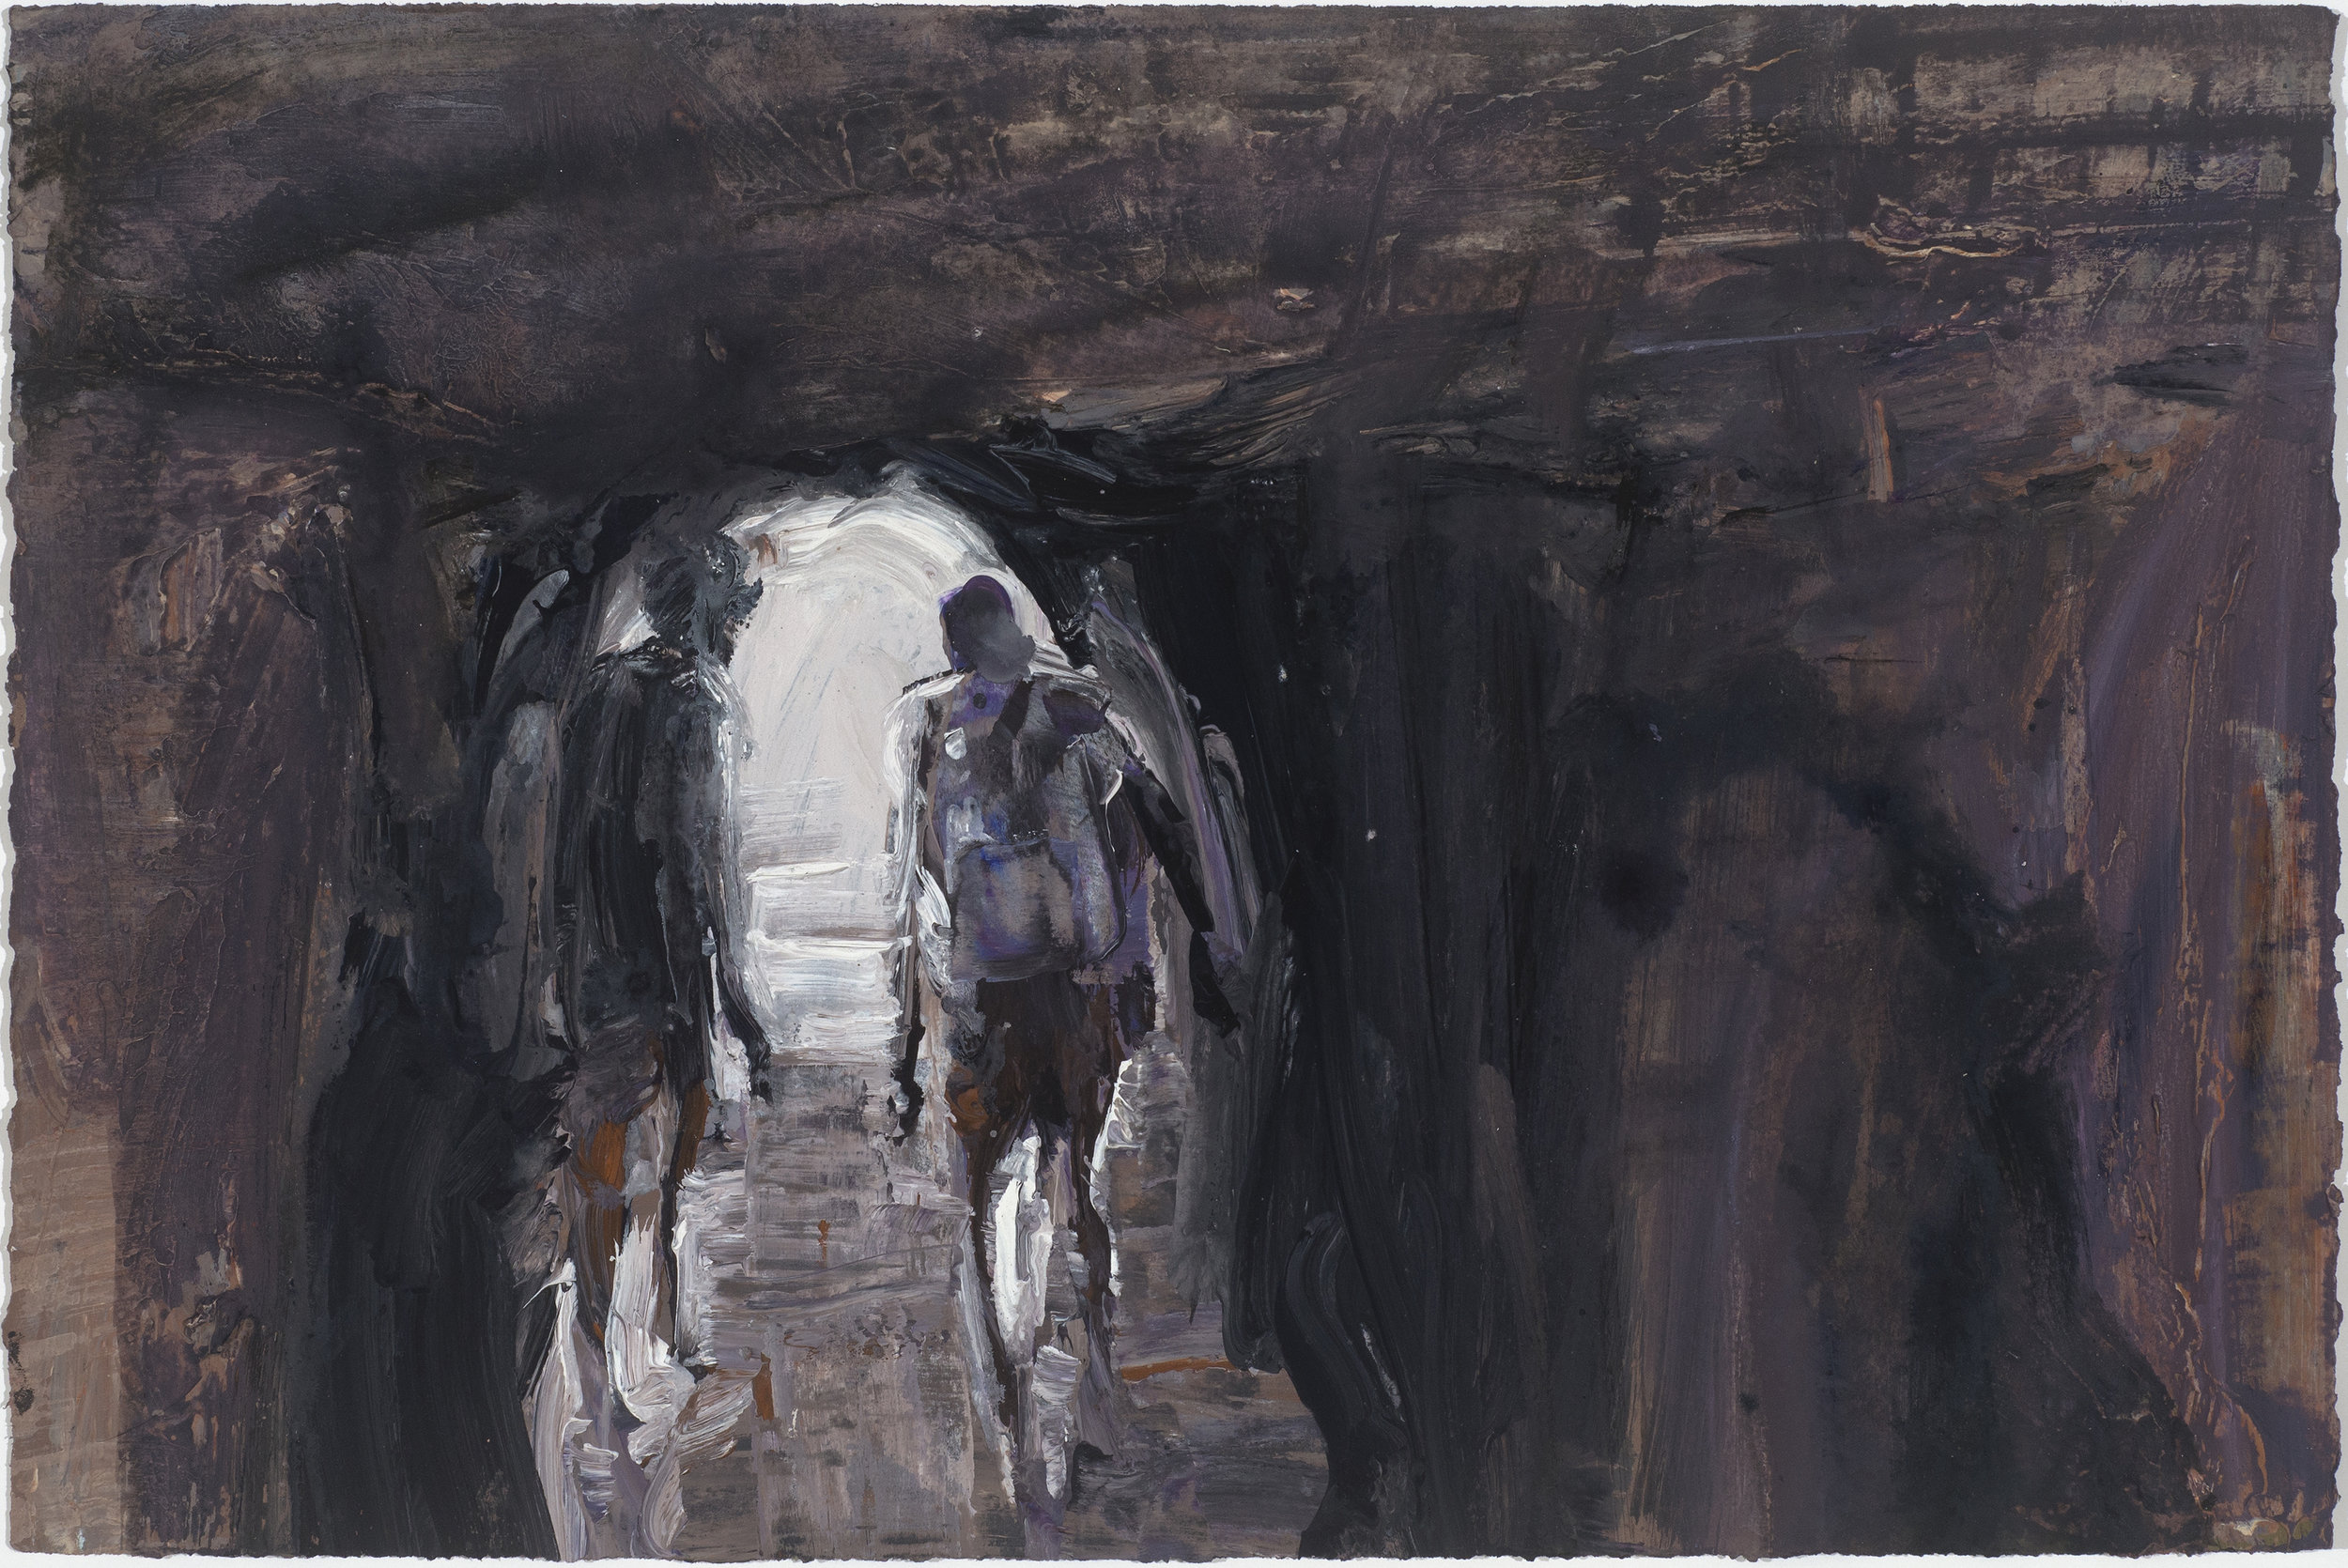 Cave study (Towards light) 10/16